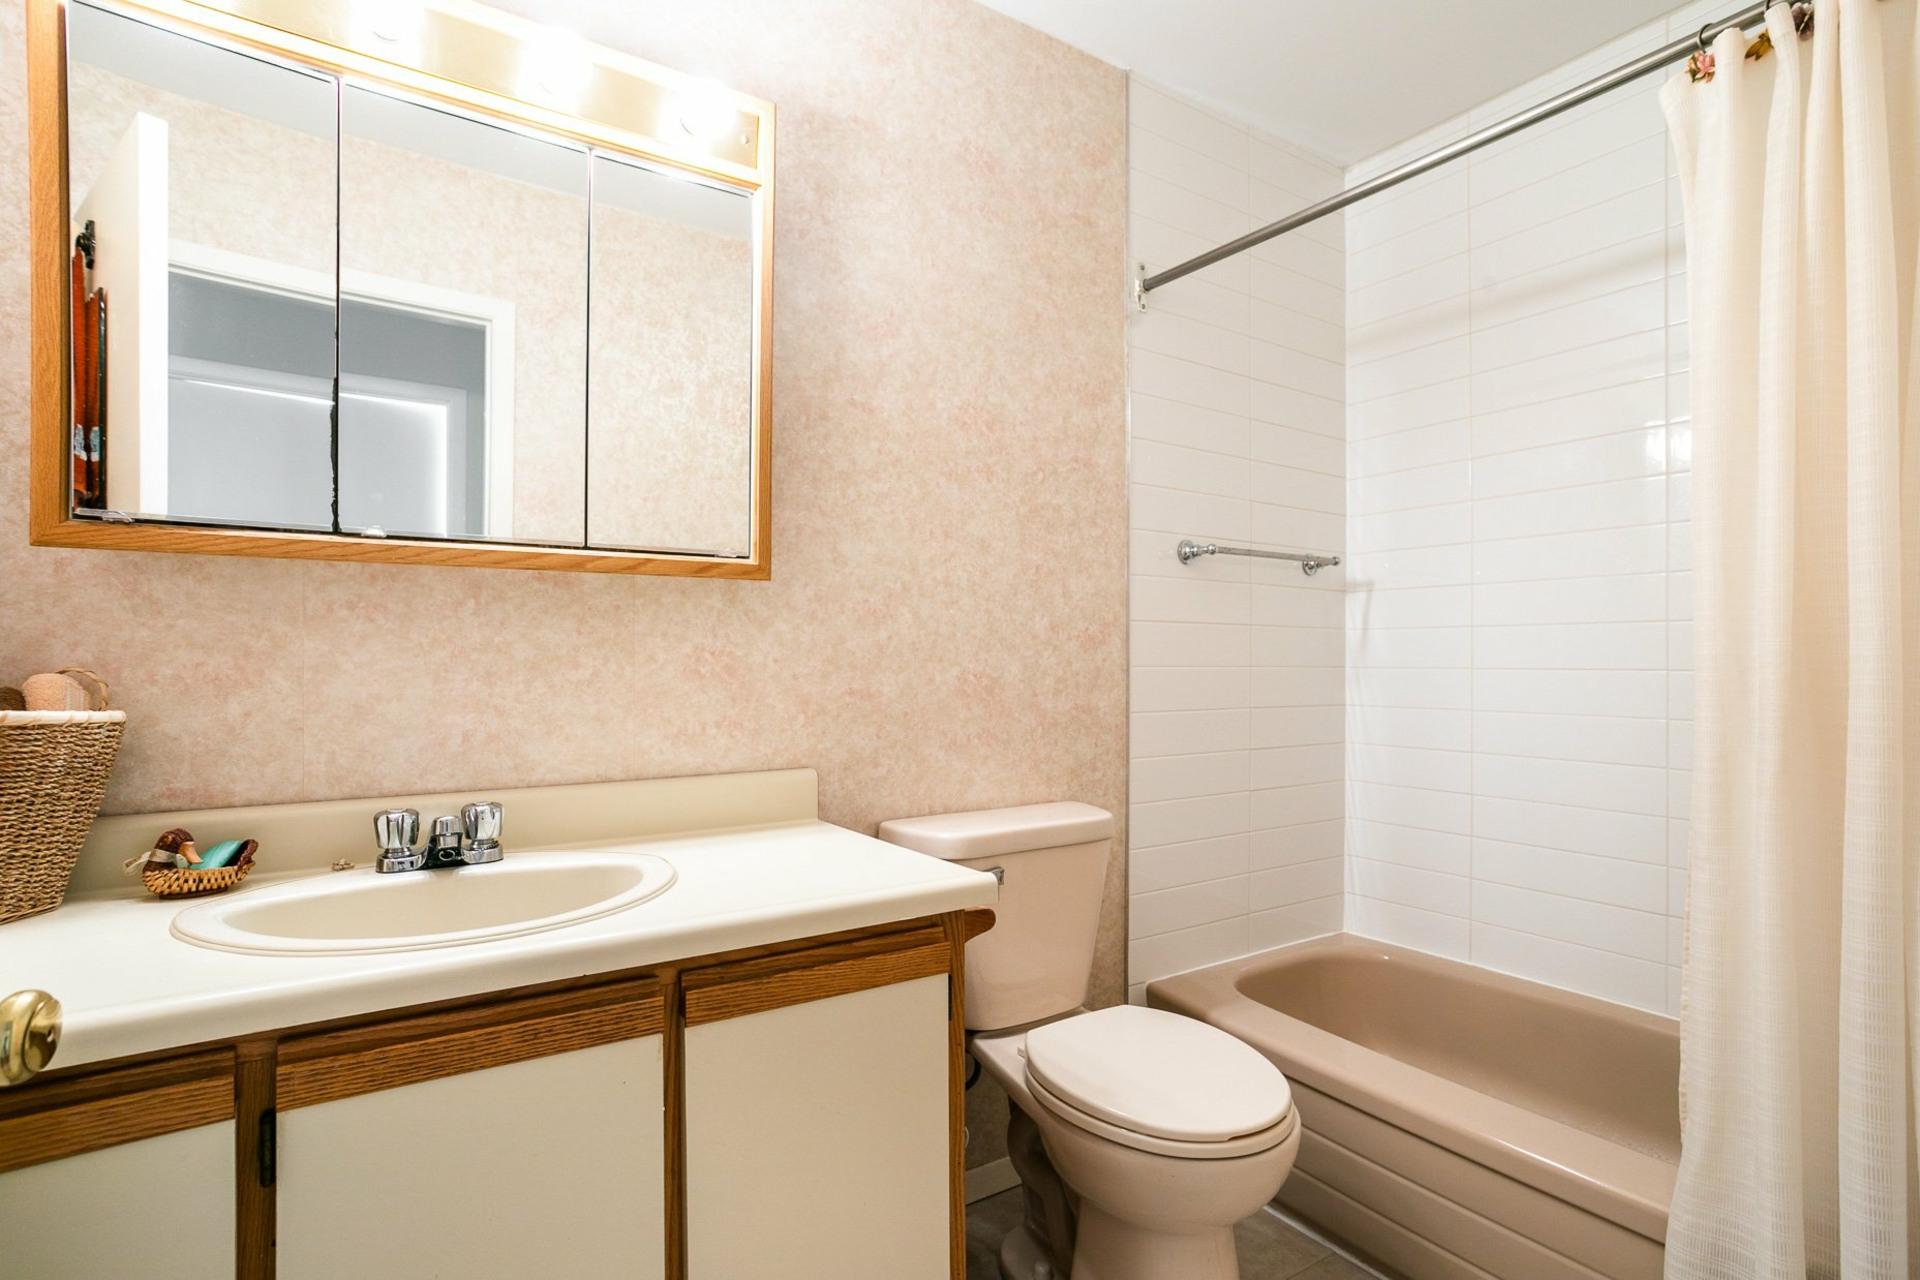 image 12 - House For sale Pierrefonds-Roxboro Montréal  - 8 rooms